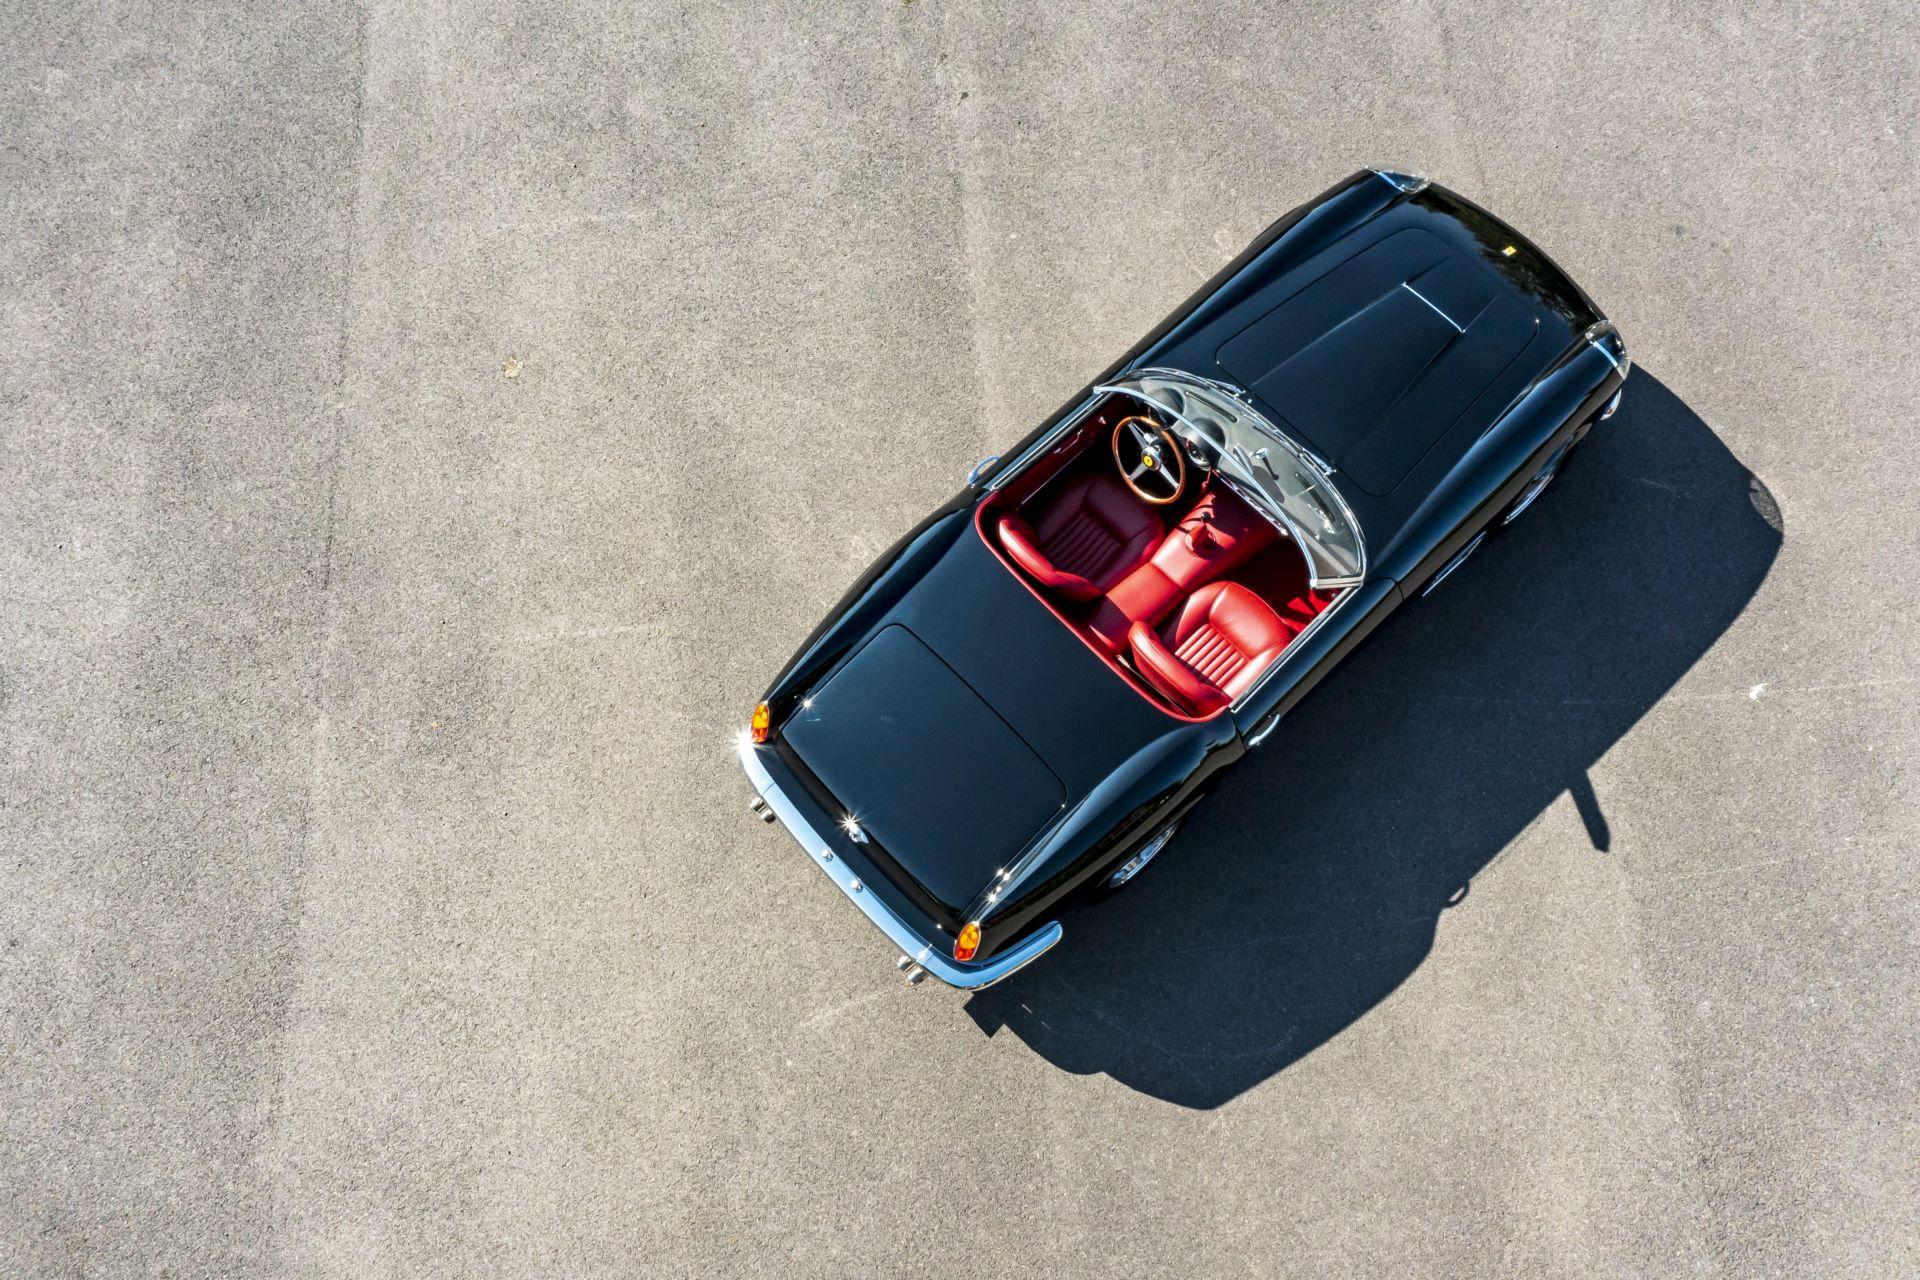 Ferrari-California-Spyder-by-GTO-Engineering-9